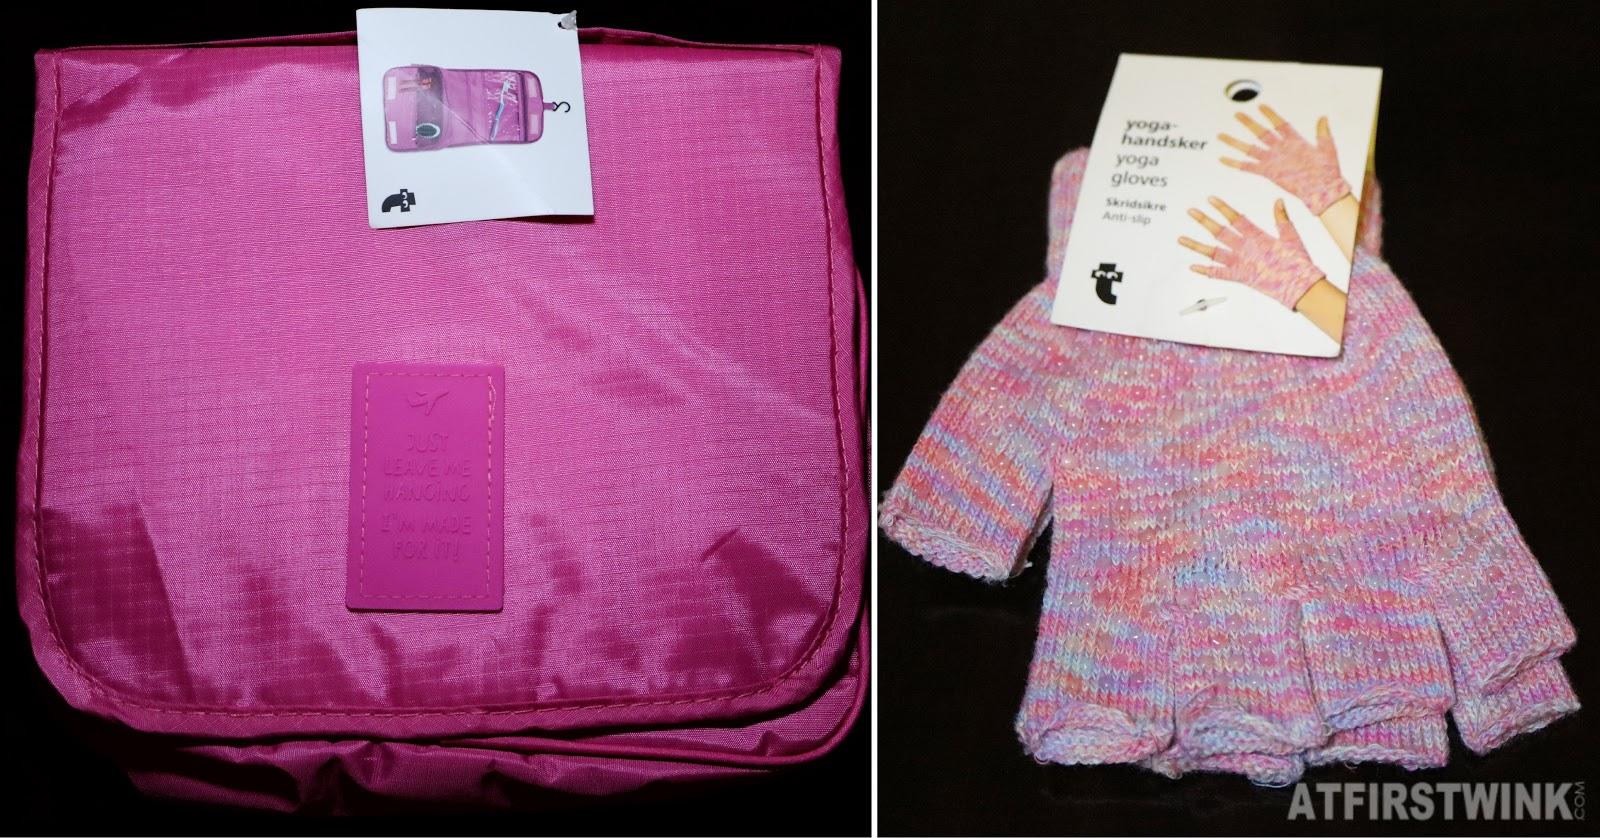 Flying tiger toiletry bag hanging travel anti-slip yoga gloves pink